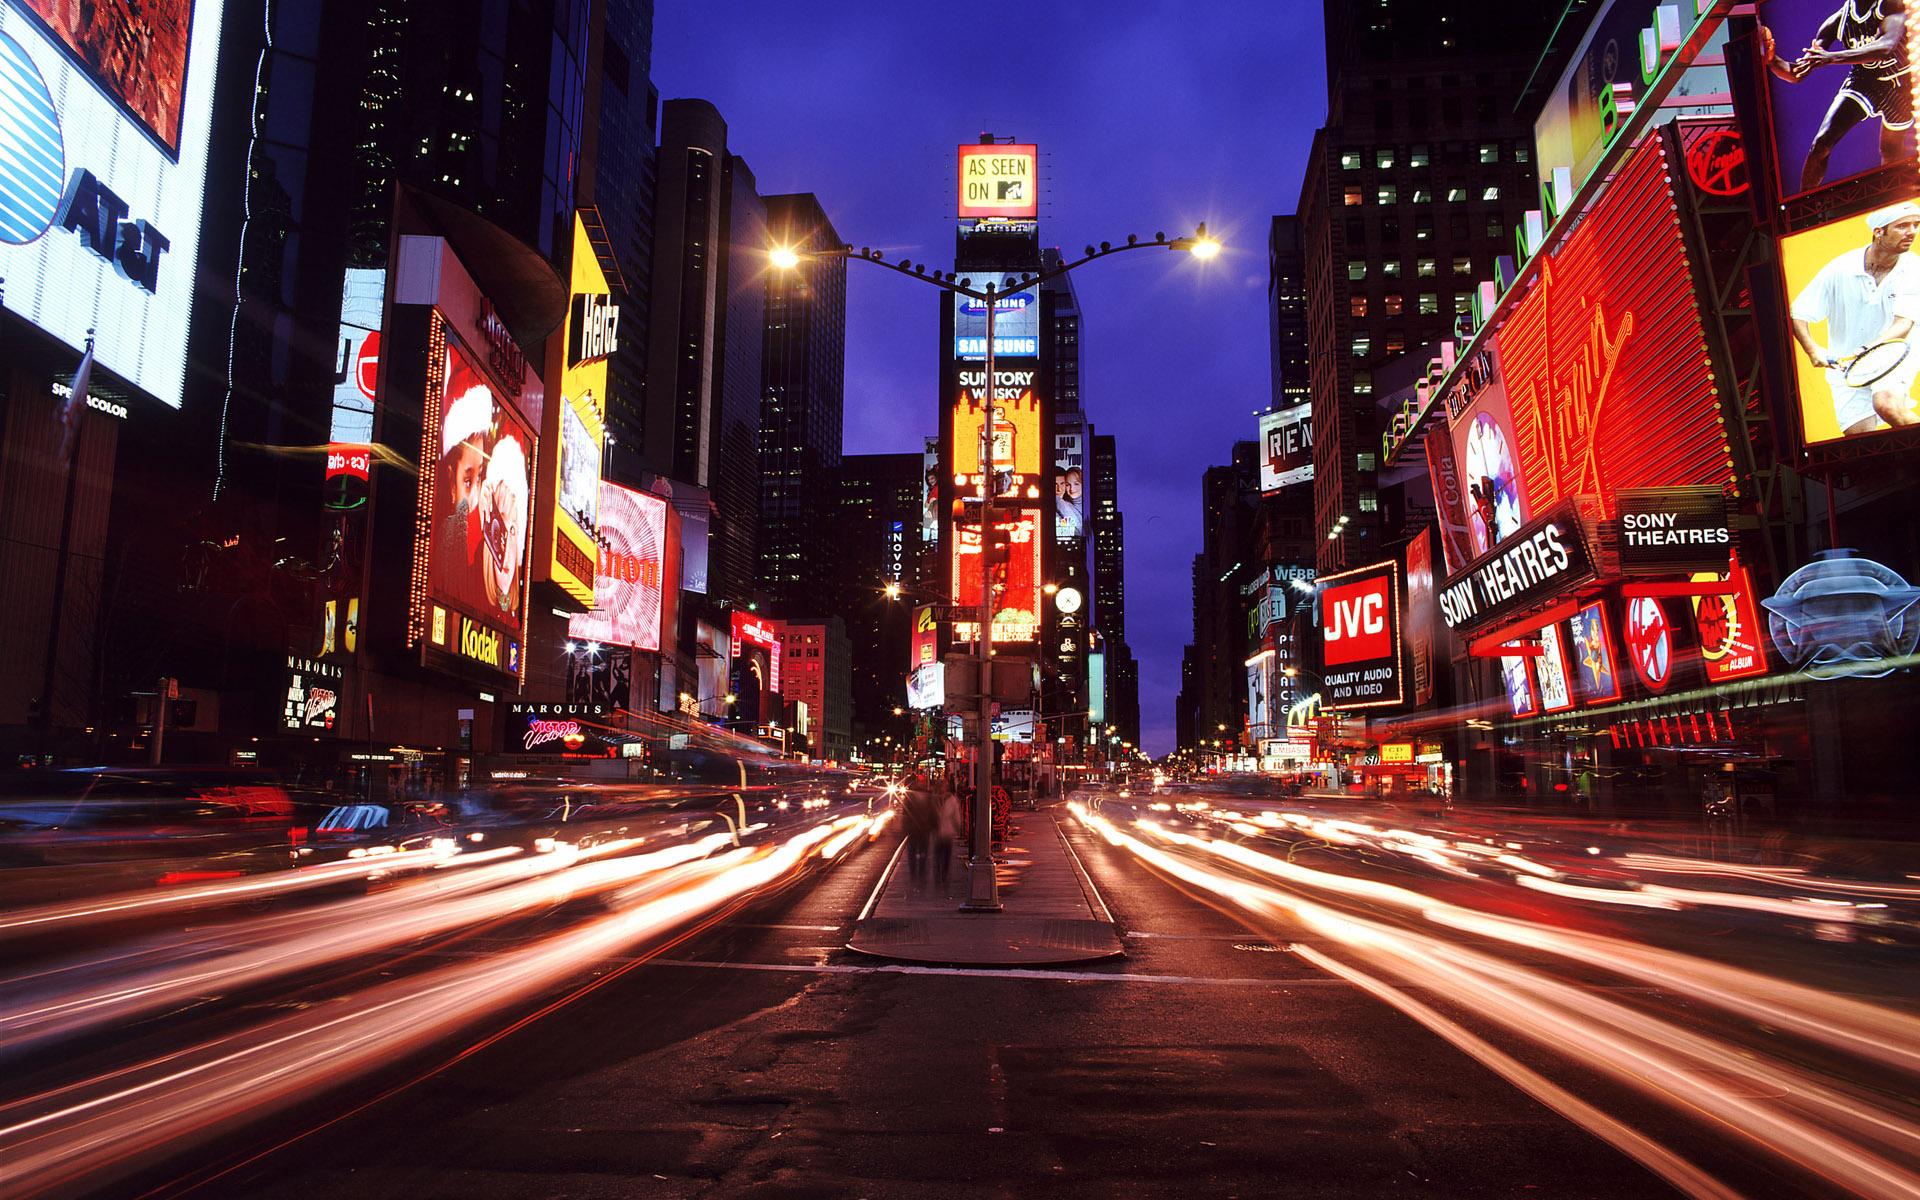 City Street at Night Background Wallpaper HD 21 hd background hd 1920x1200